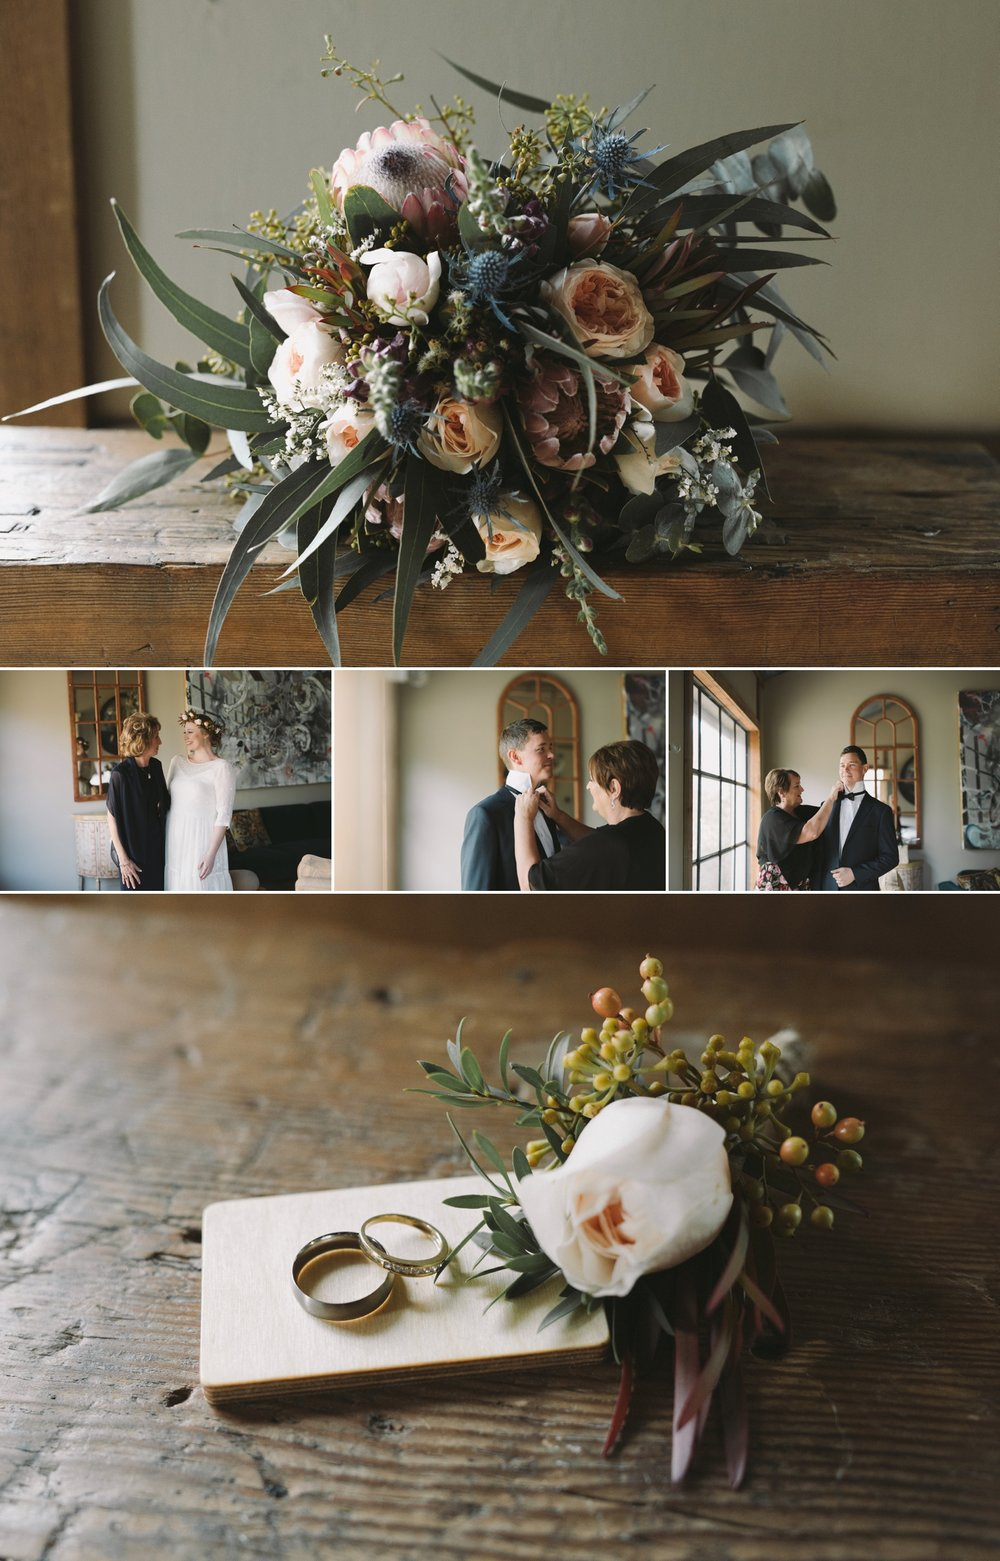 Jo & Aaron - Natural Wedding Photography in Adelaide - Beautiful, modern wedding photographer - Al Ru Farm Wedding Photography - Katherine Schultz_0005.jpg